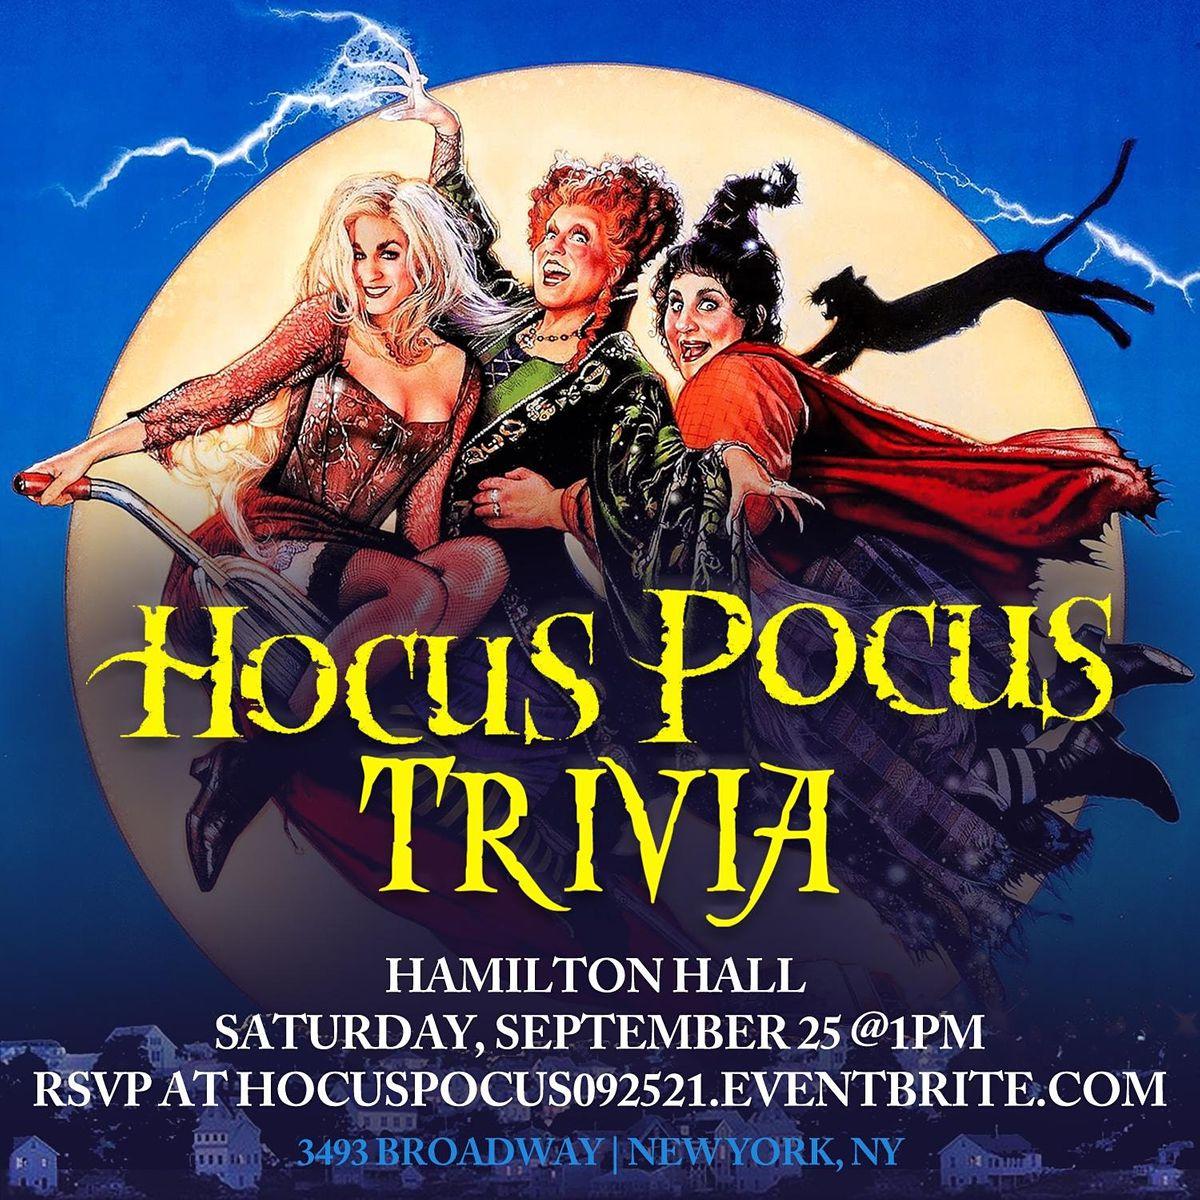 Hocus Pocus Trivia, 25 September | Event in New York | AllEvents.in